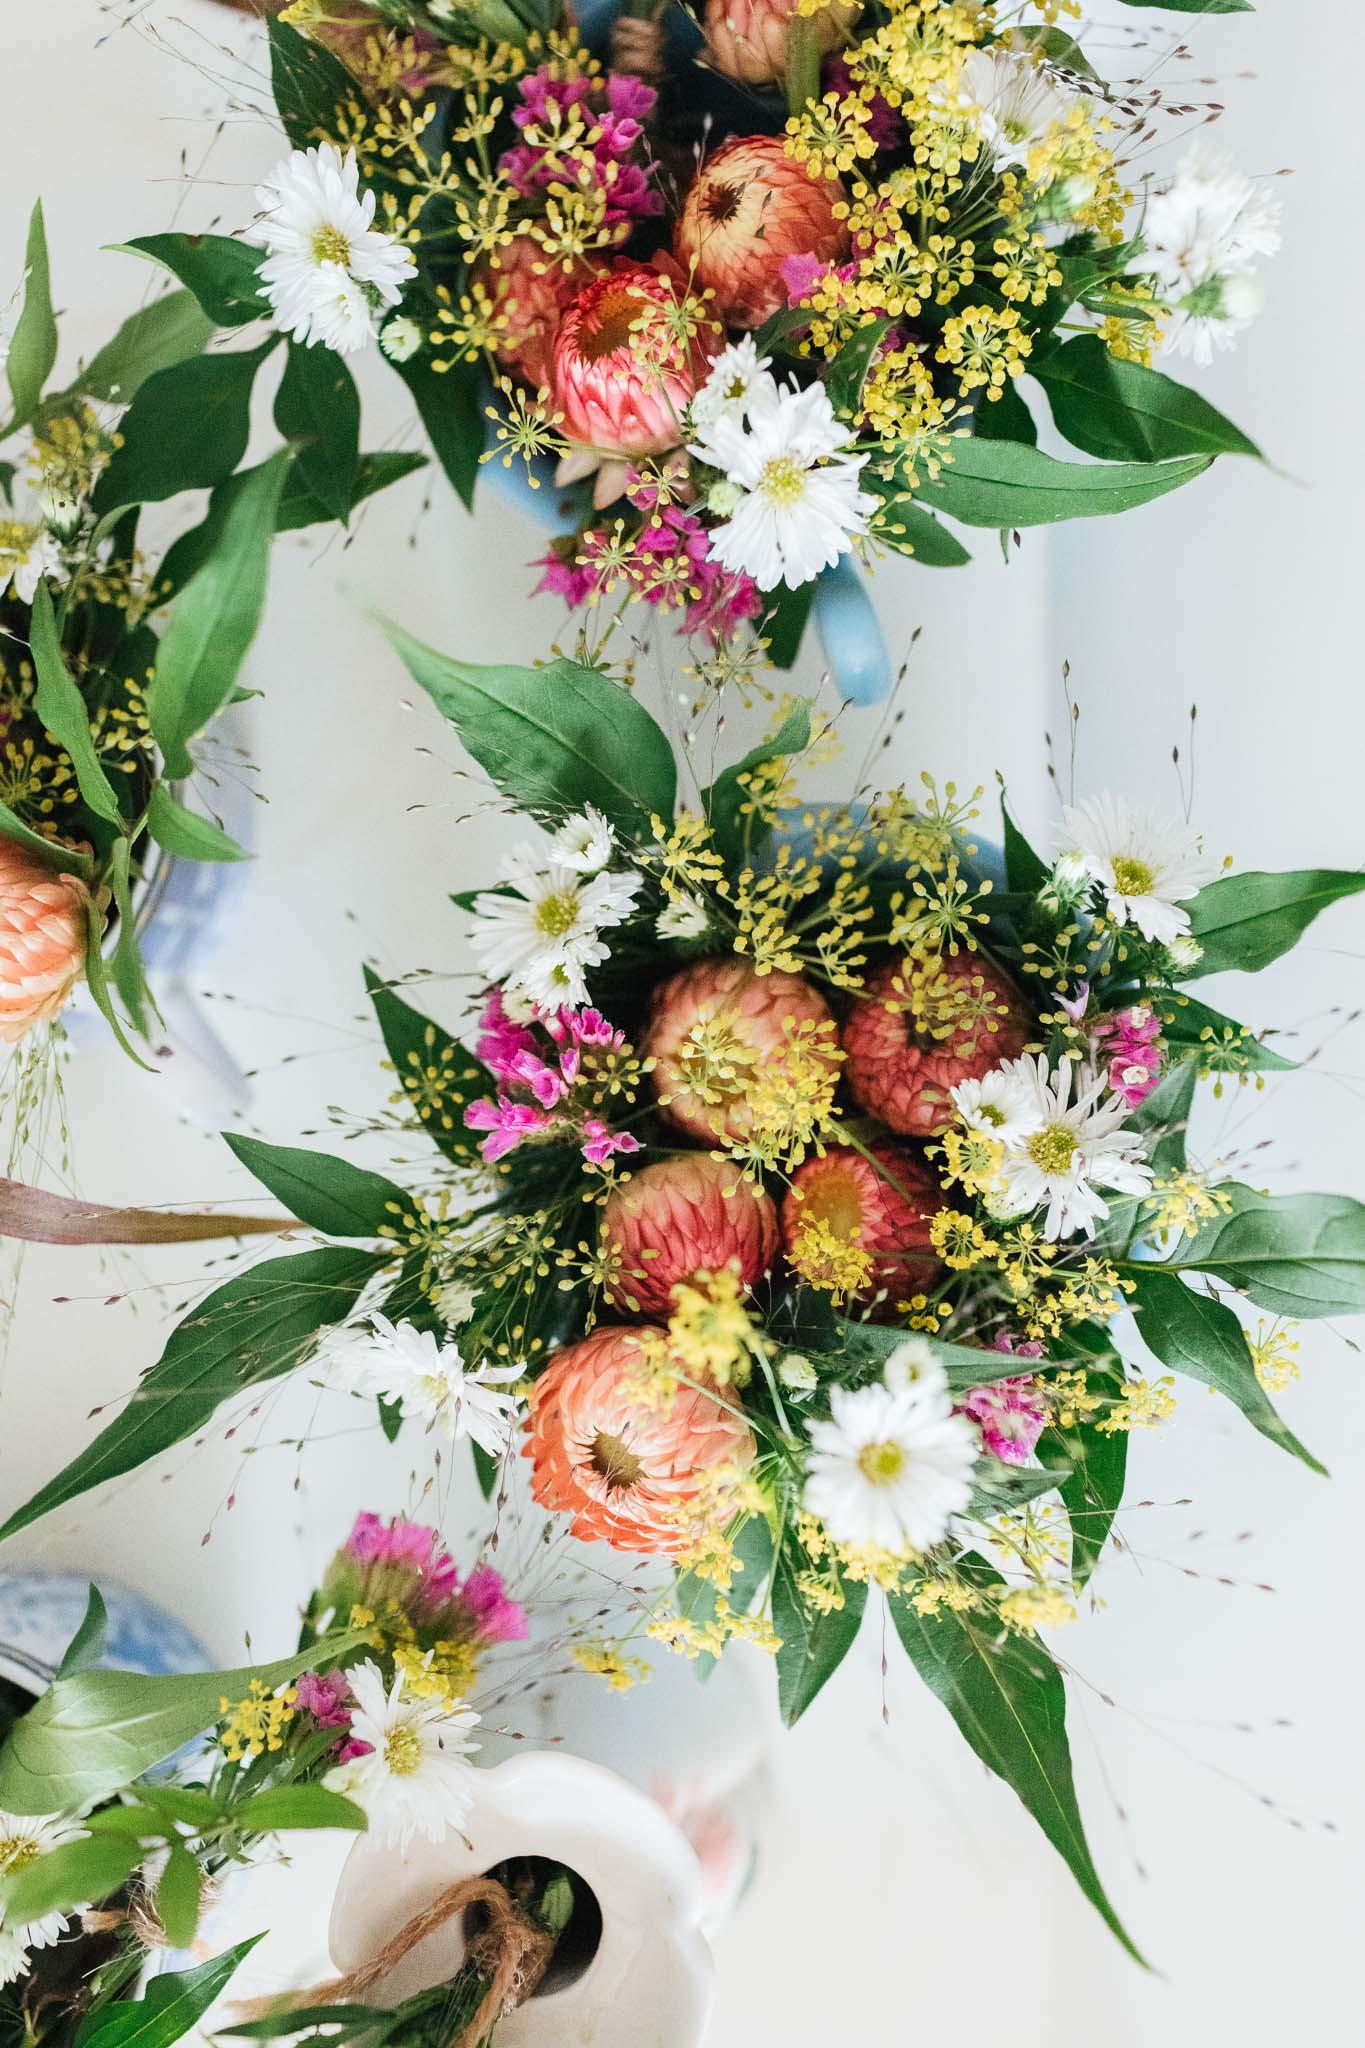 TogetherNess Weddings - John Wellings Photography